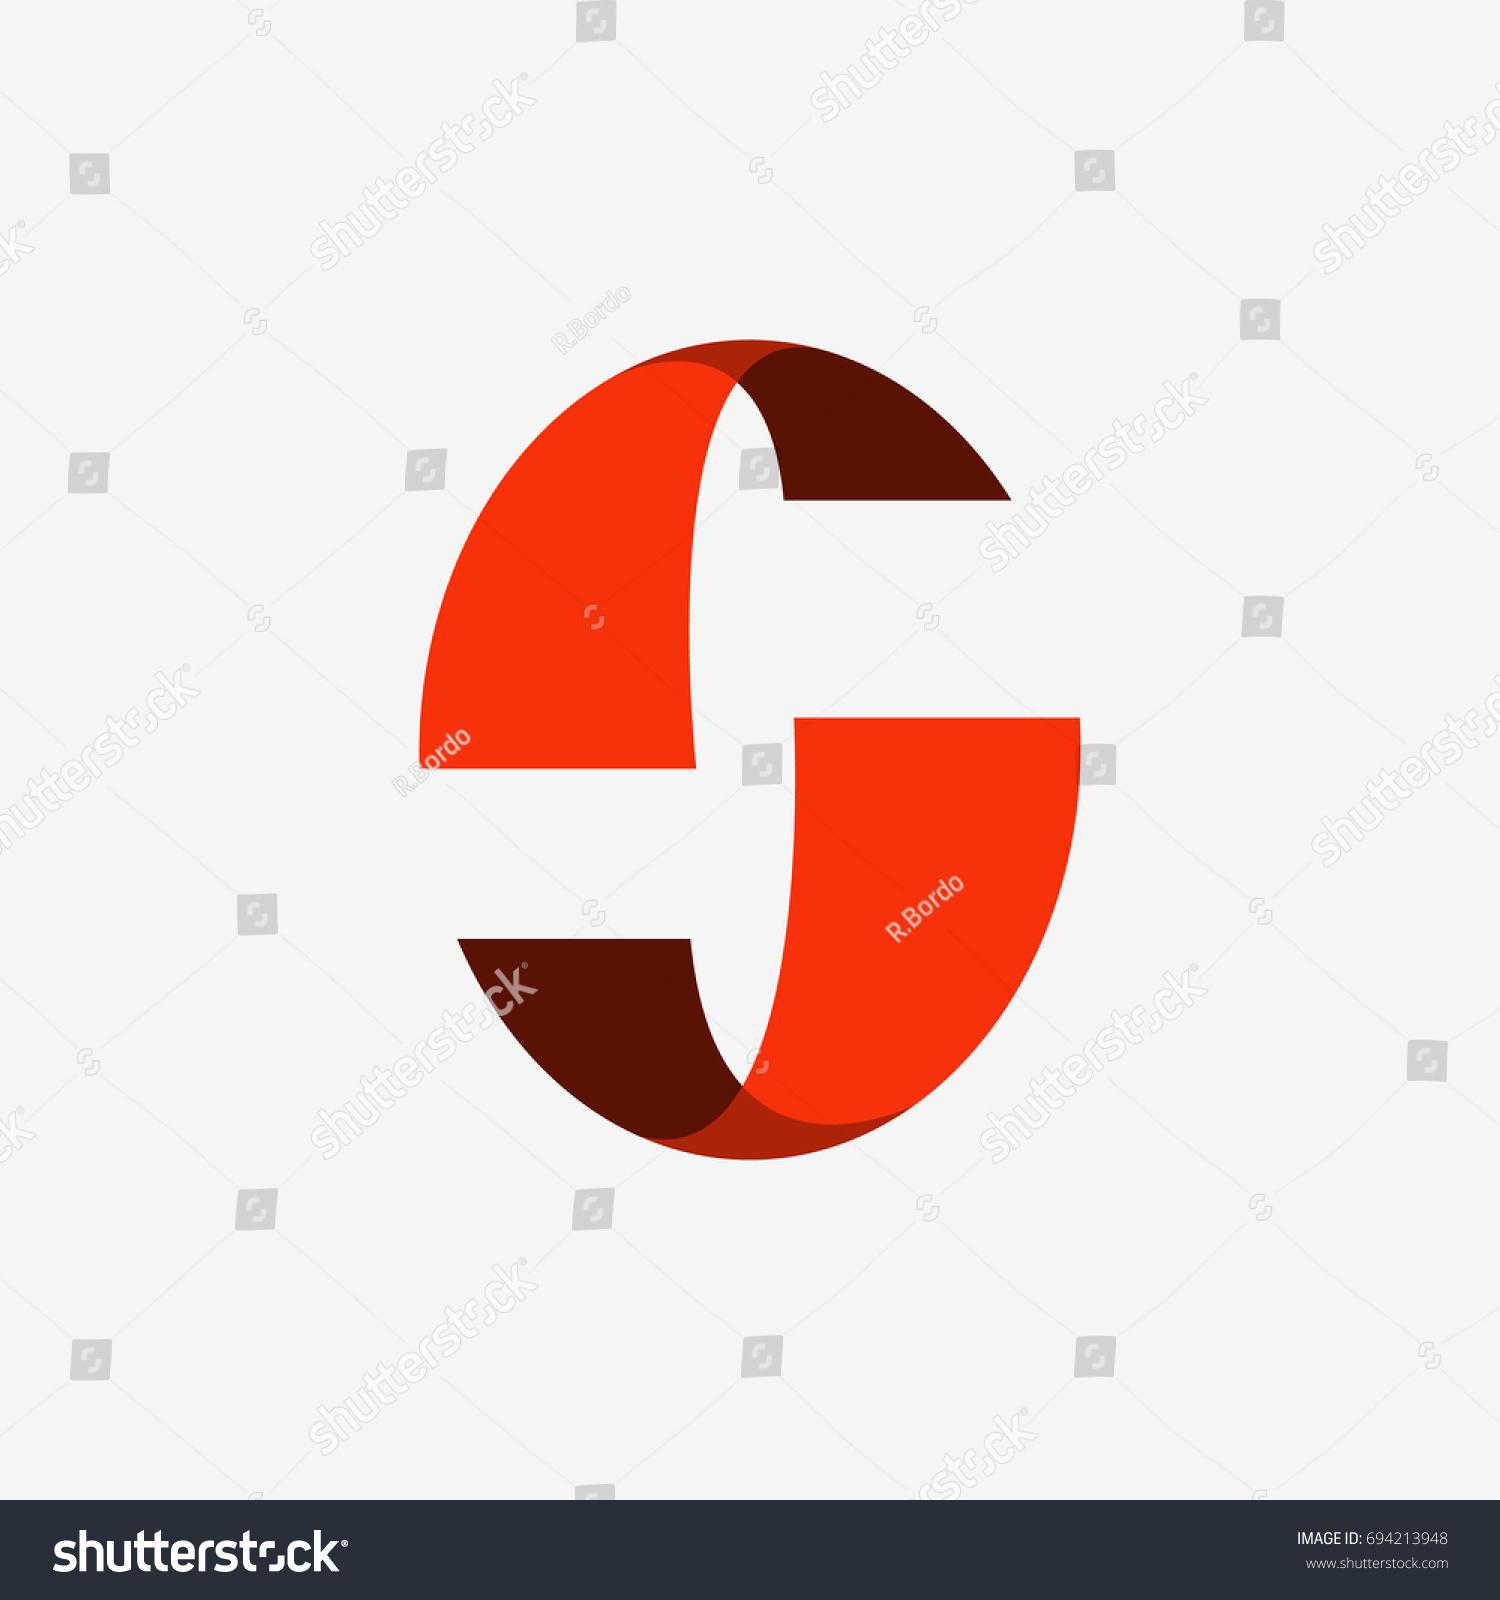 Letter c vector company logo futuristic stock vector 694213948 letter c vector company logo futuristic circle 3d concept symbol letter c monogram biocorpaavc Images